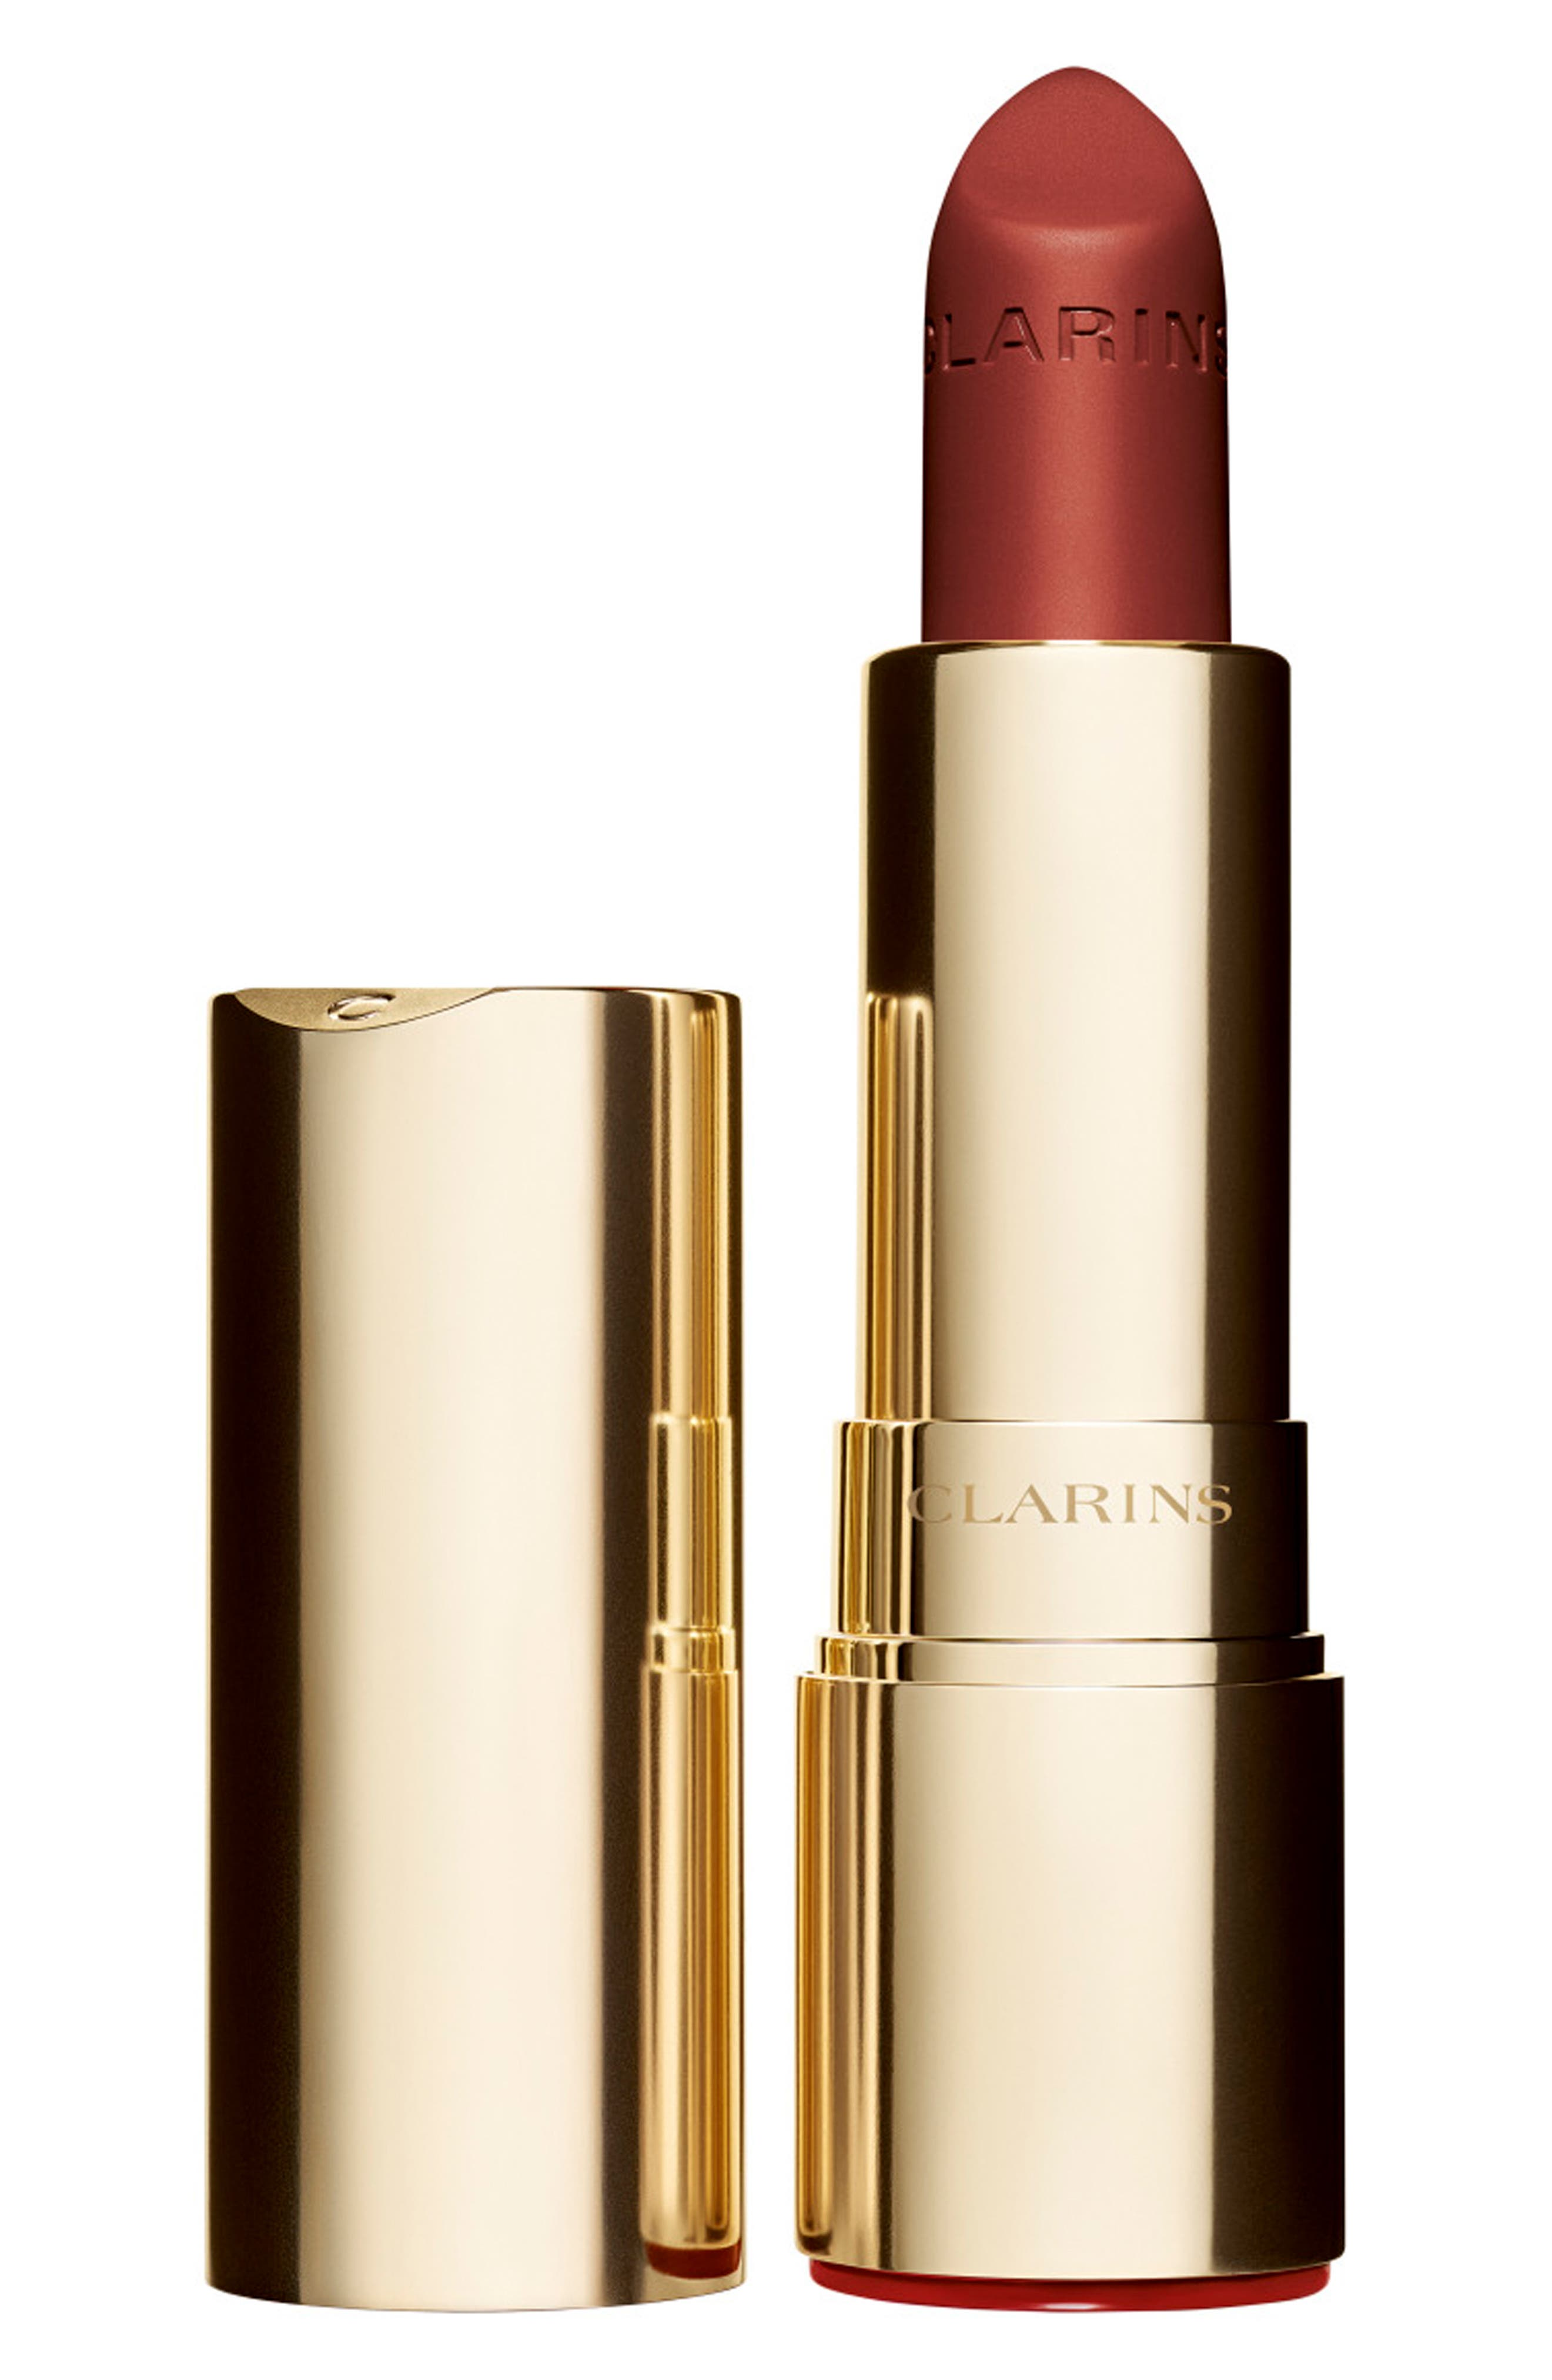 CLARINS, Joli Rouge Velvet Matte Lipstick, Main thumbnail 1, color, 737 SPICY CINNAMON